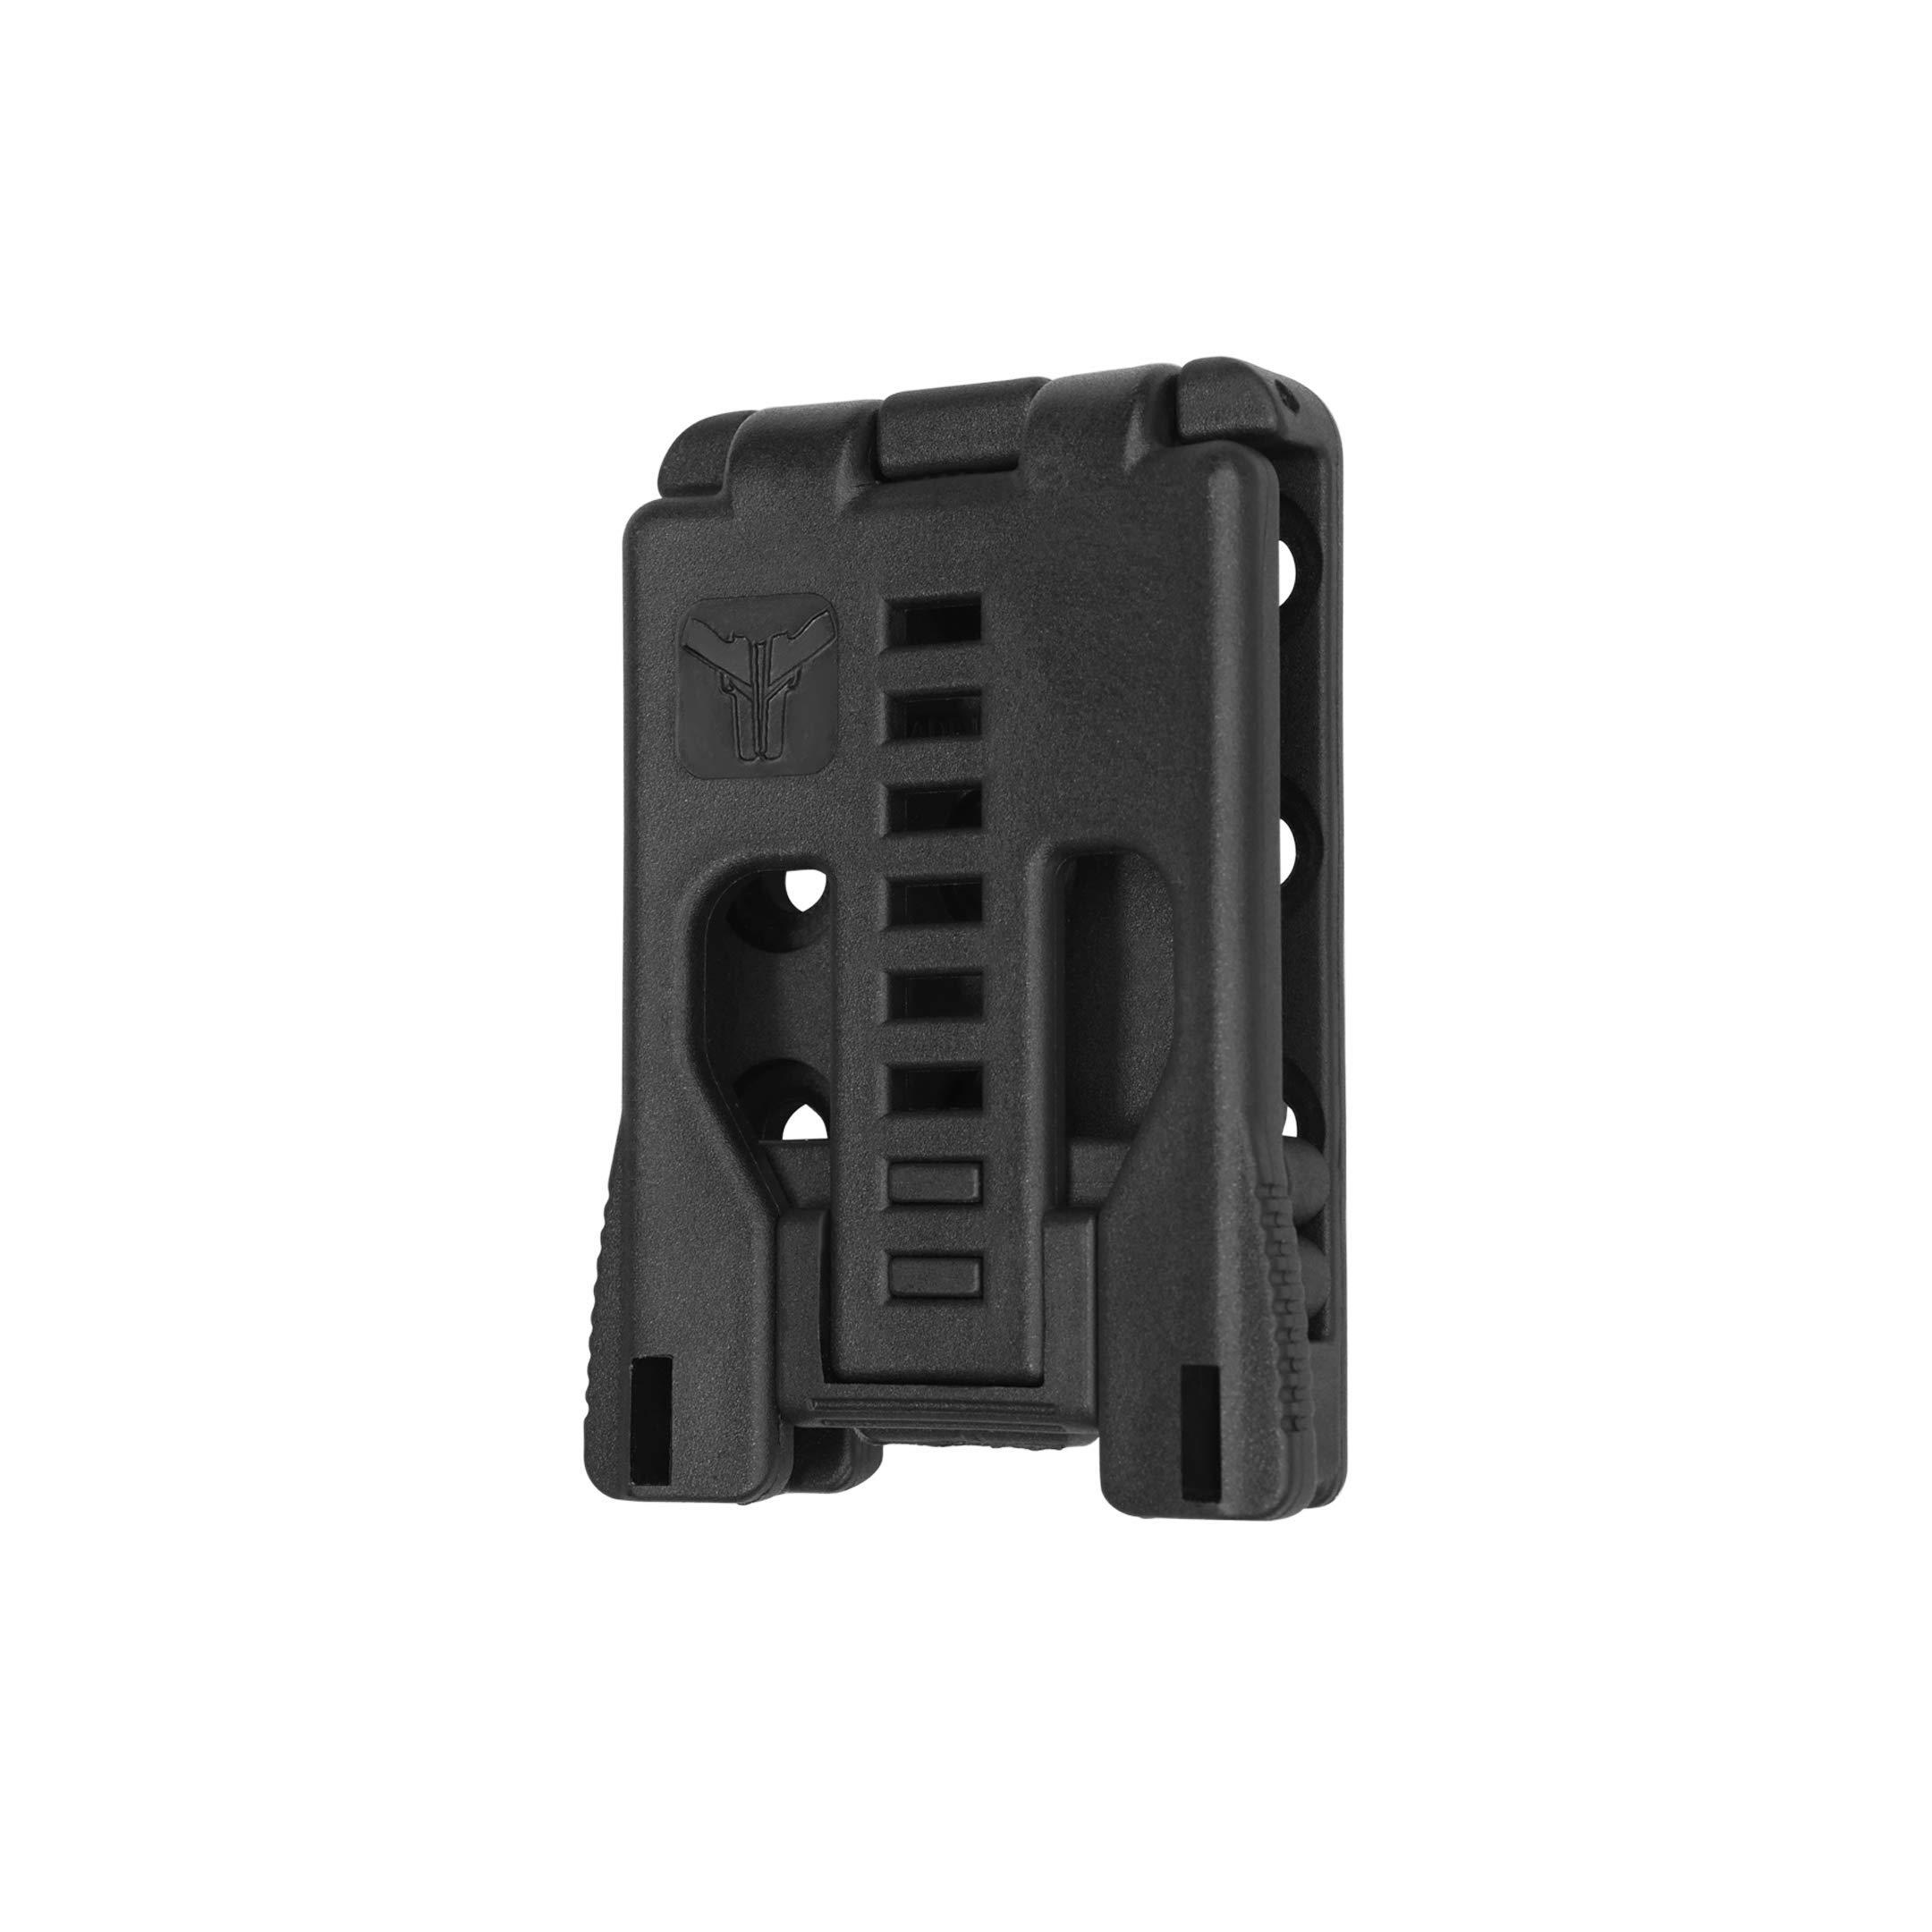 Blade-Tech Tek-Lok with Hardware (1 - Pack)